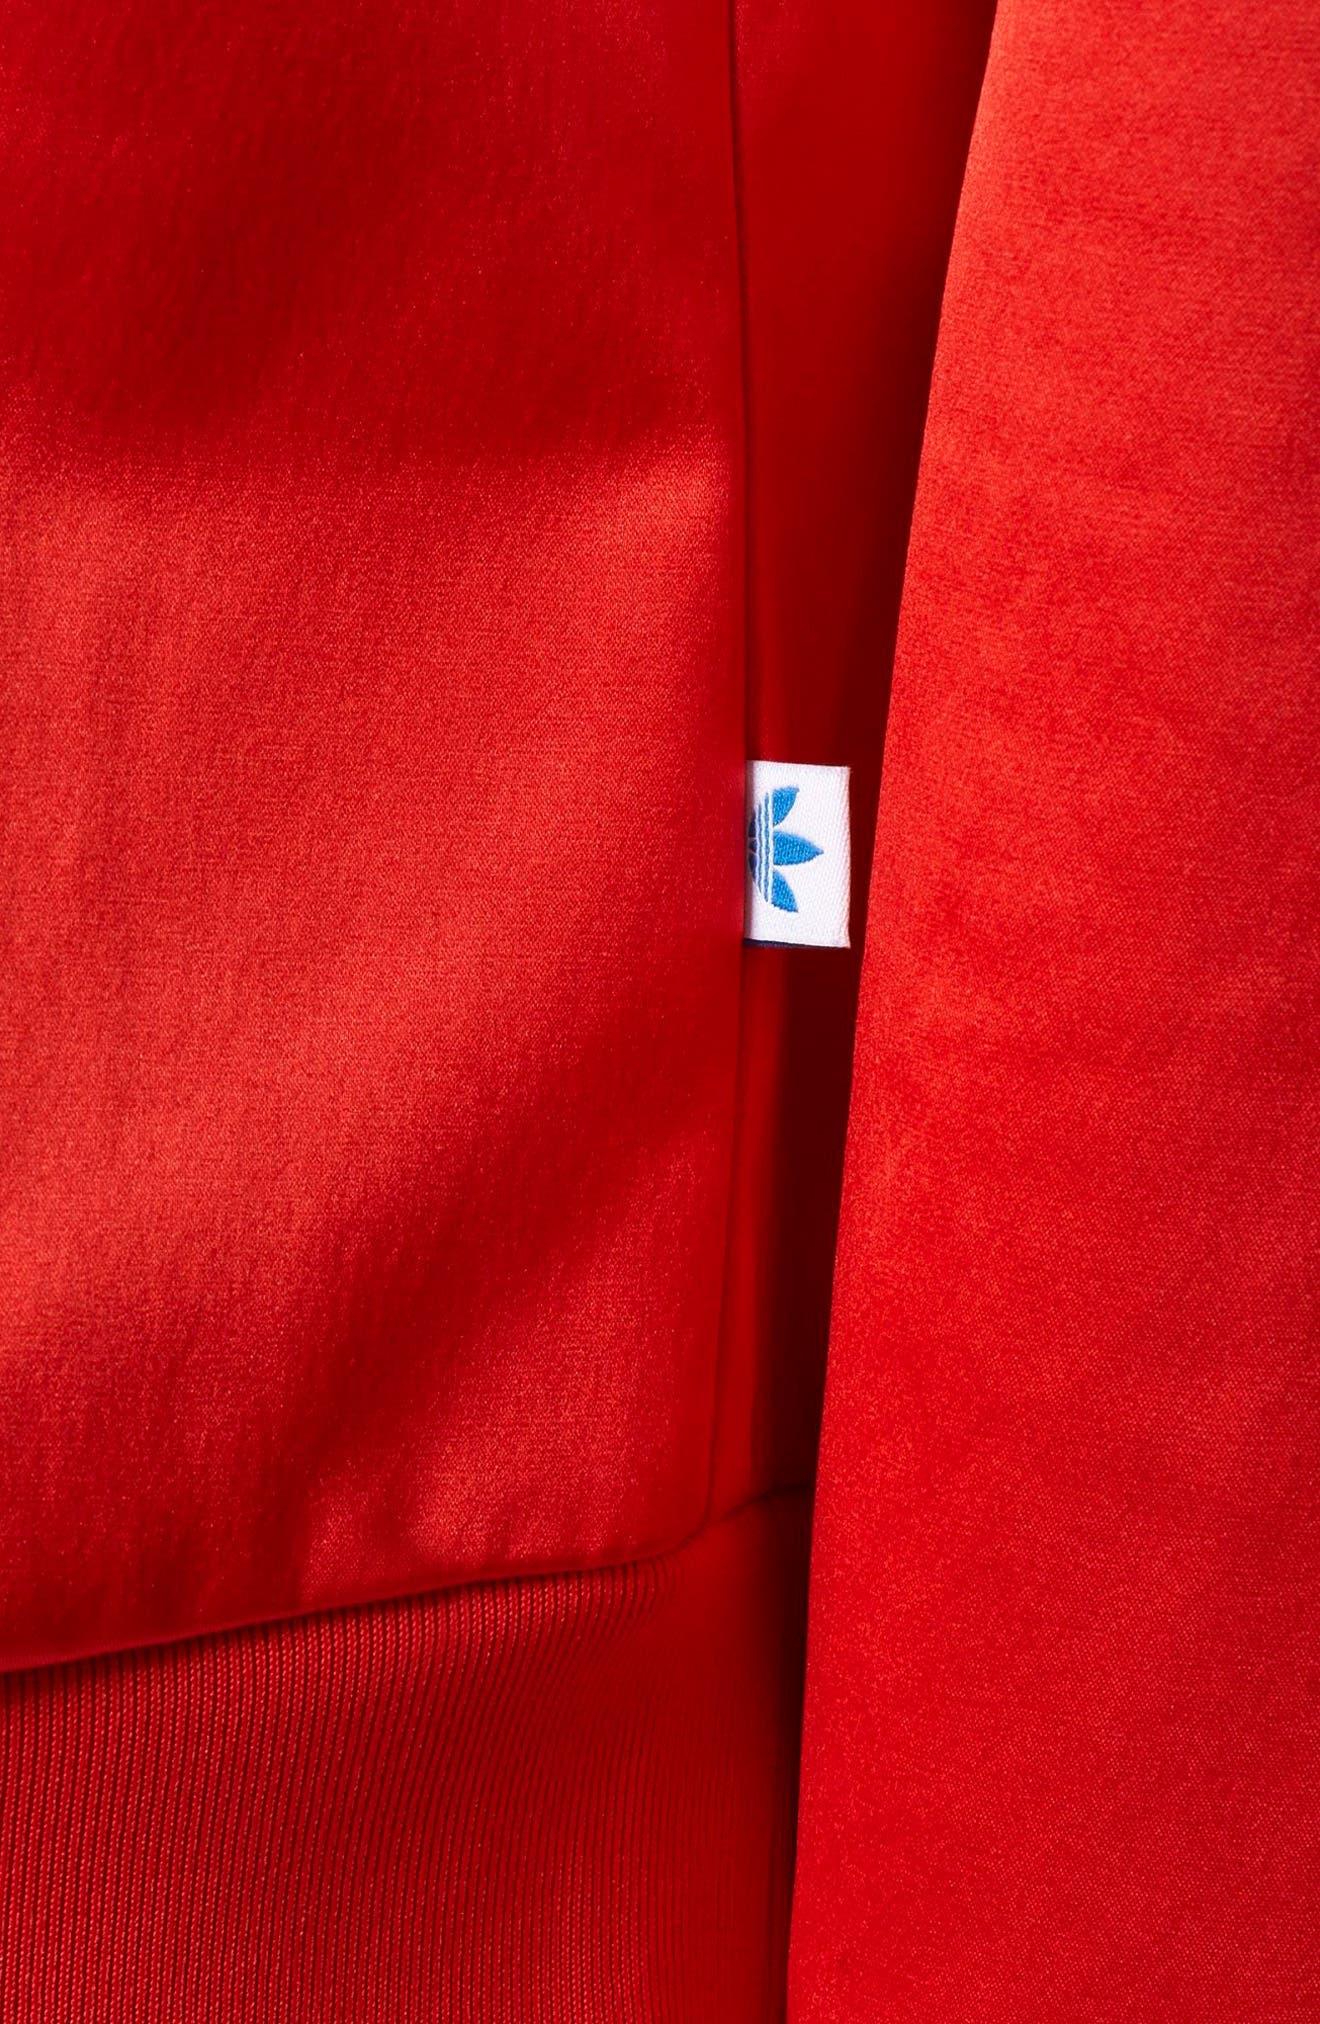 Trefoil Crewneck Sweater,                             Alternate thumbnail 6, color,                             Vivid Red S13